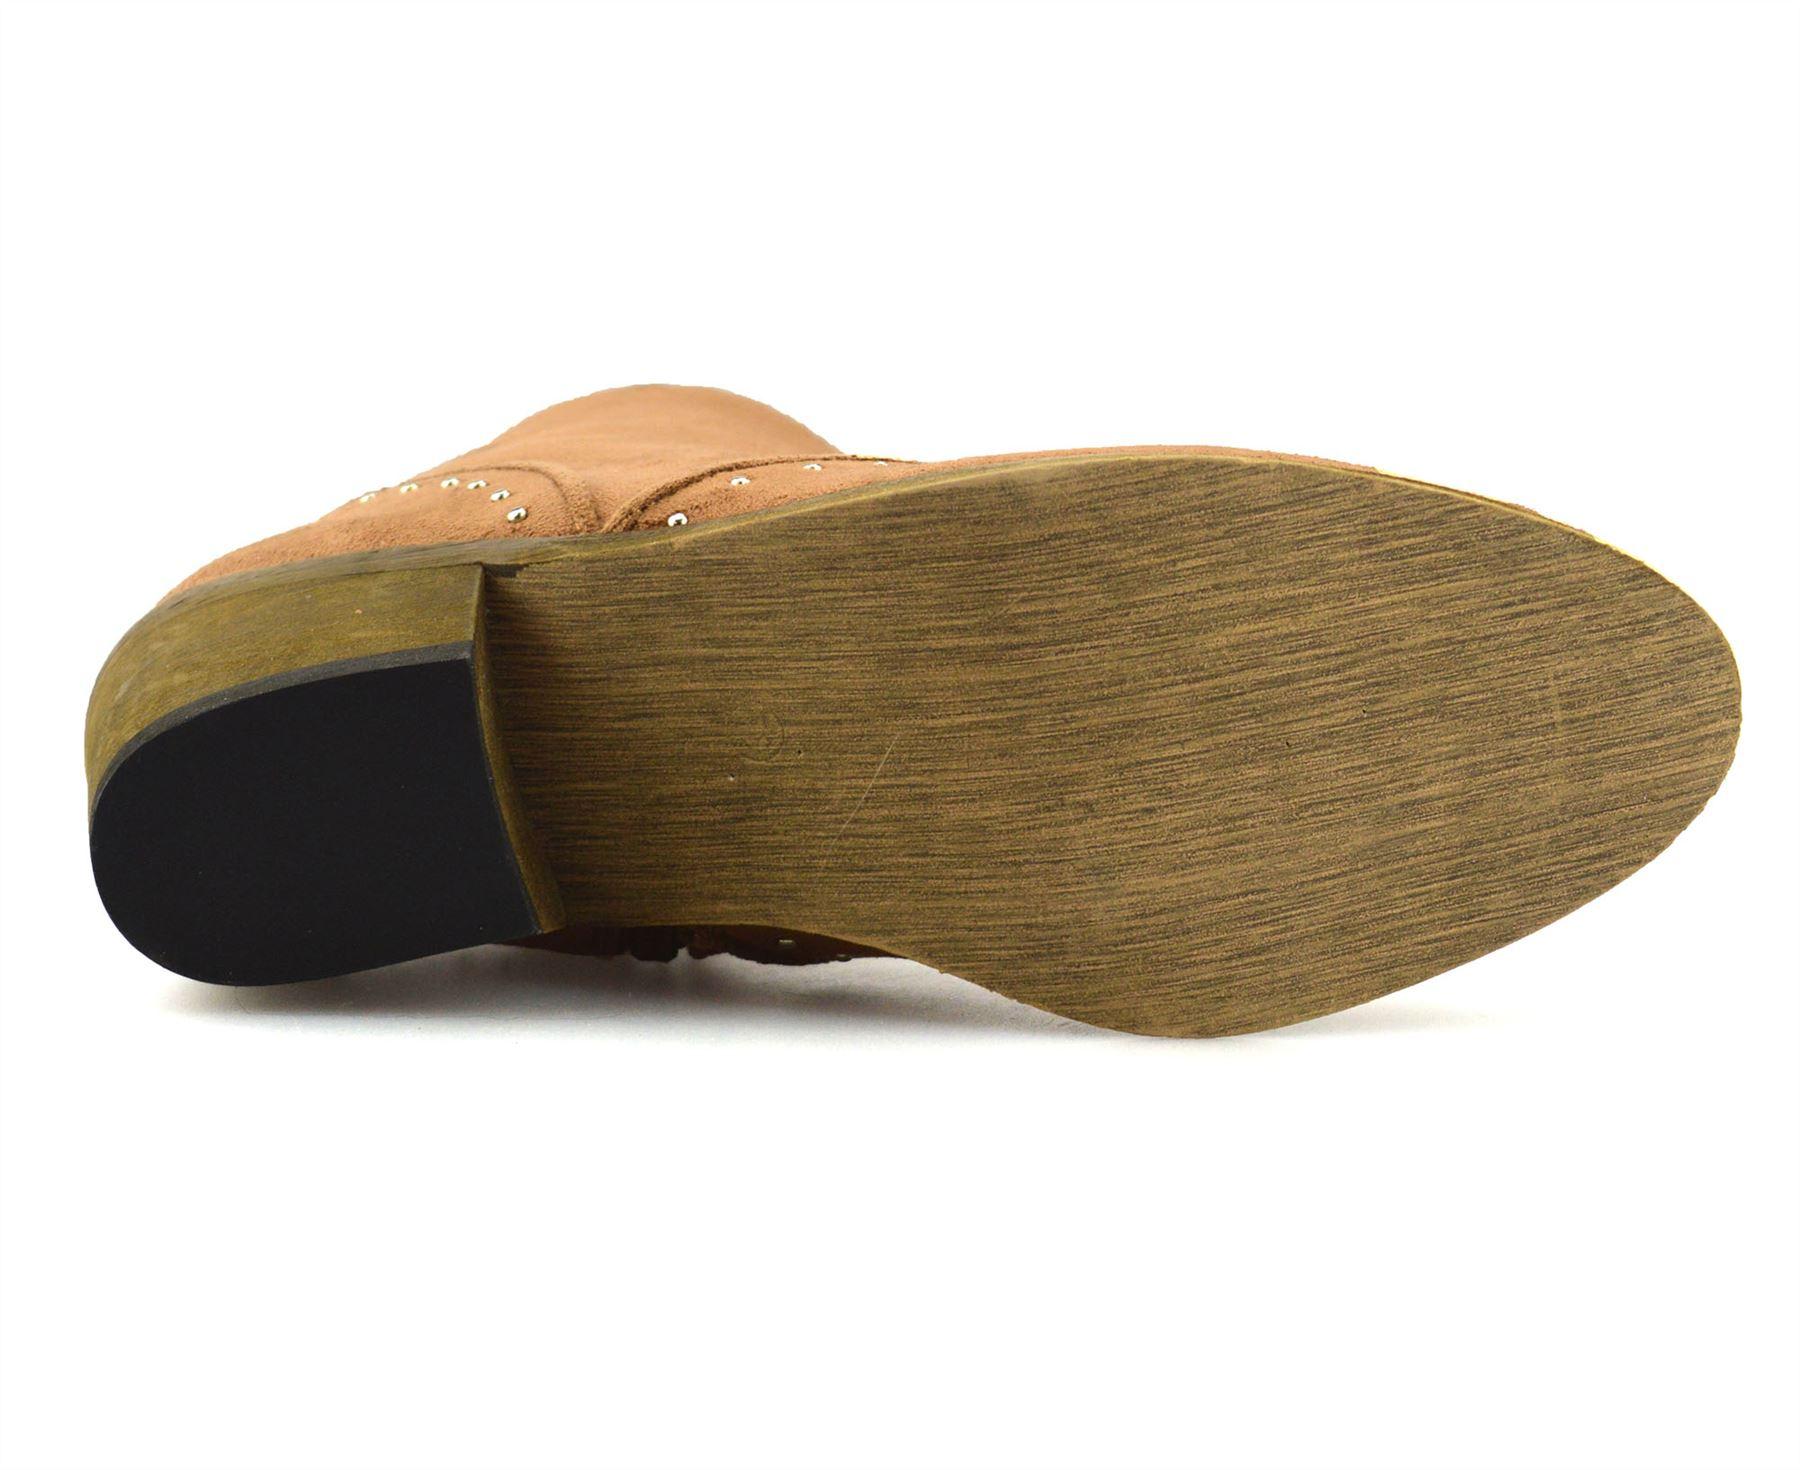 Ladies-Womens-Suede-Mid-Block-Heel-Zip-Up-Ankle-Cowboy-Biker-Boots-Shoes-Size thumbnail 21